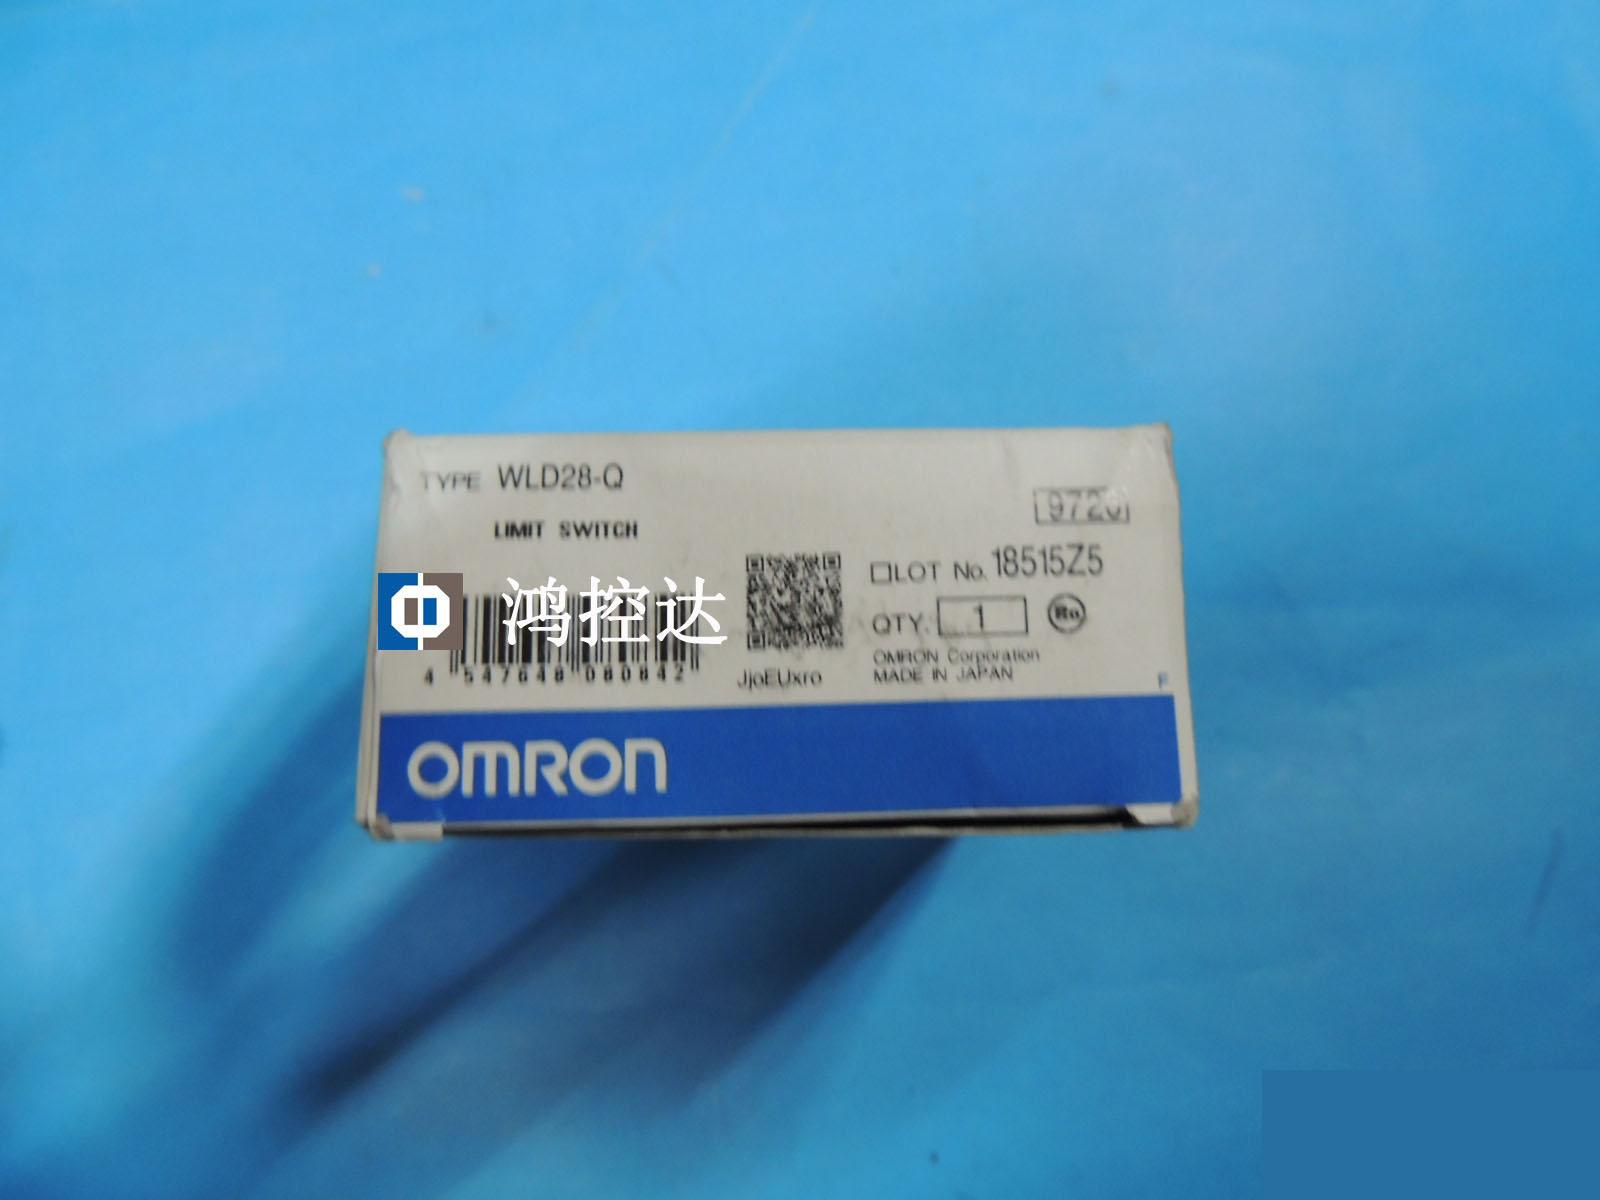 New stroke switch WLD28-QNew stroke switch WLD28-Q